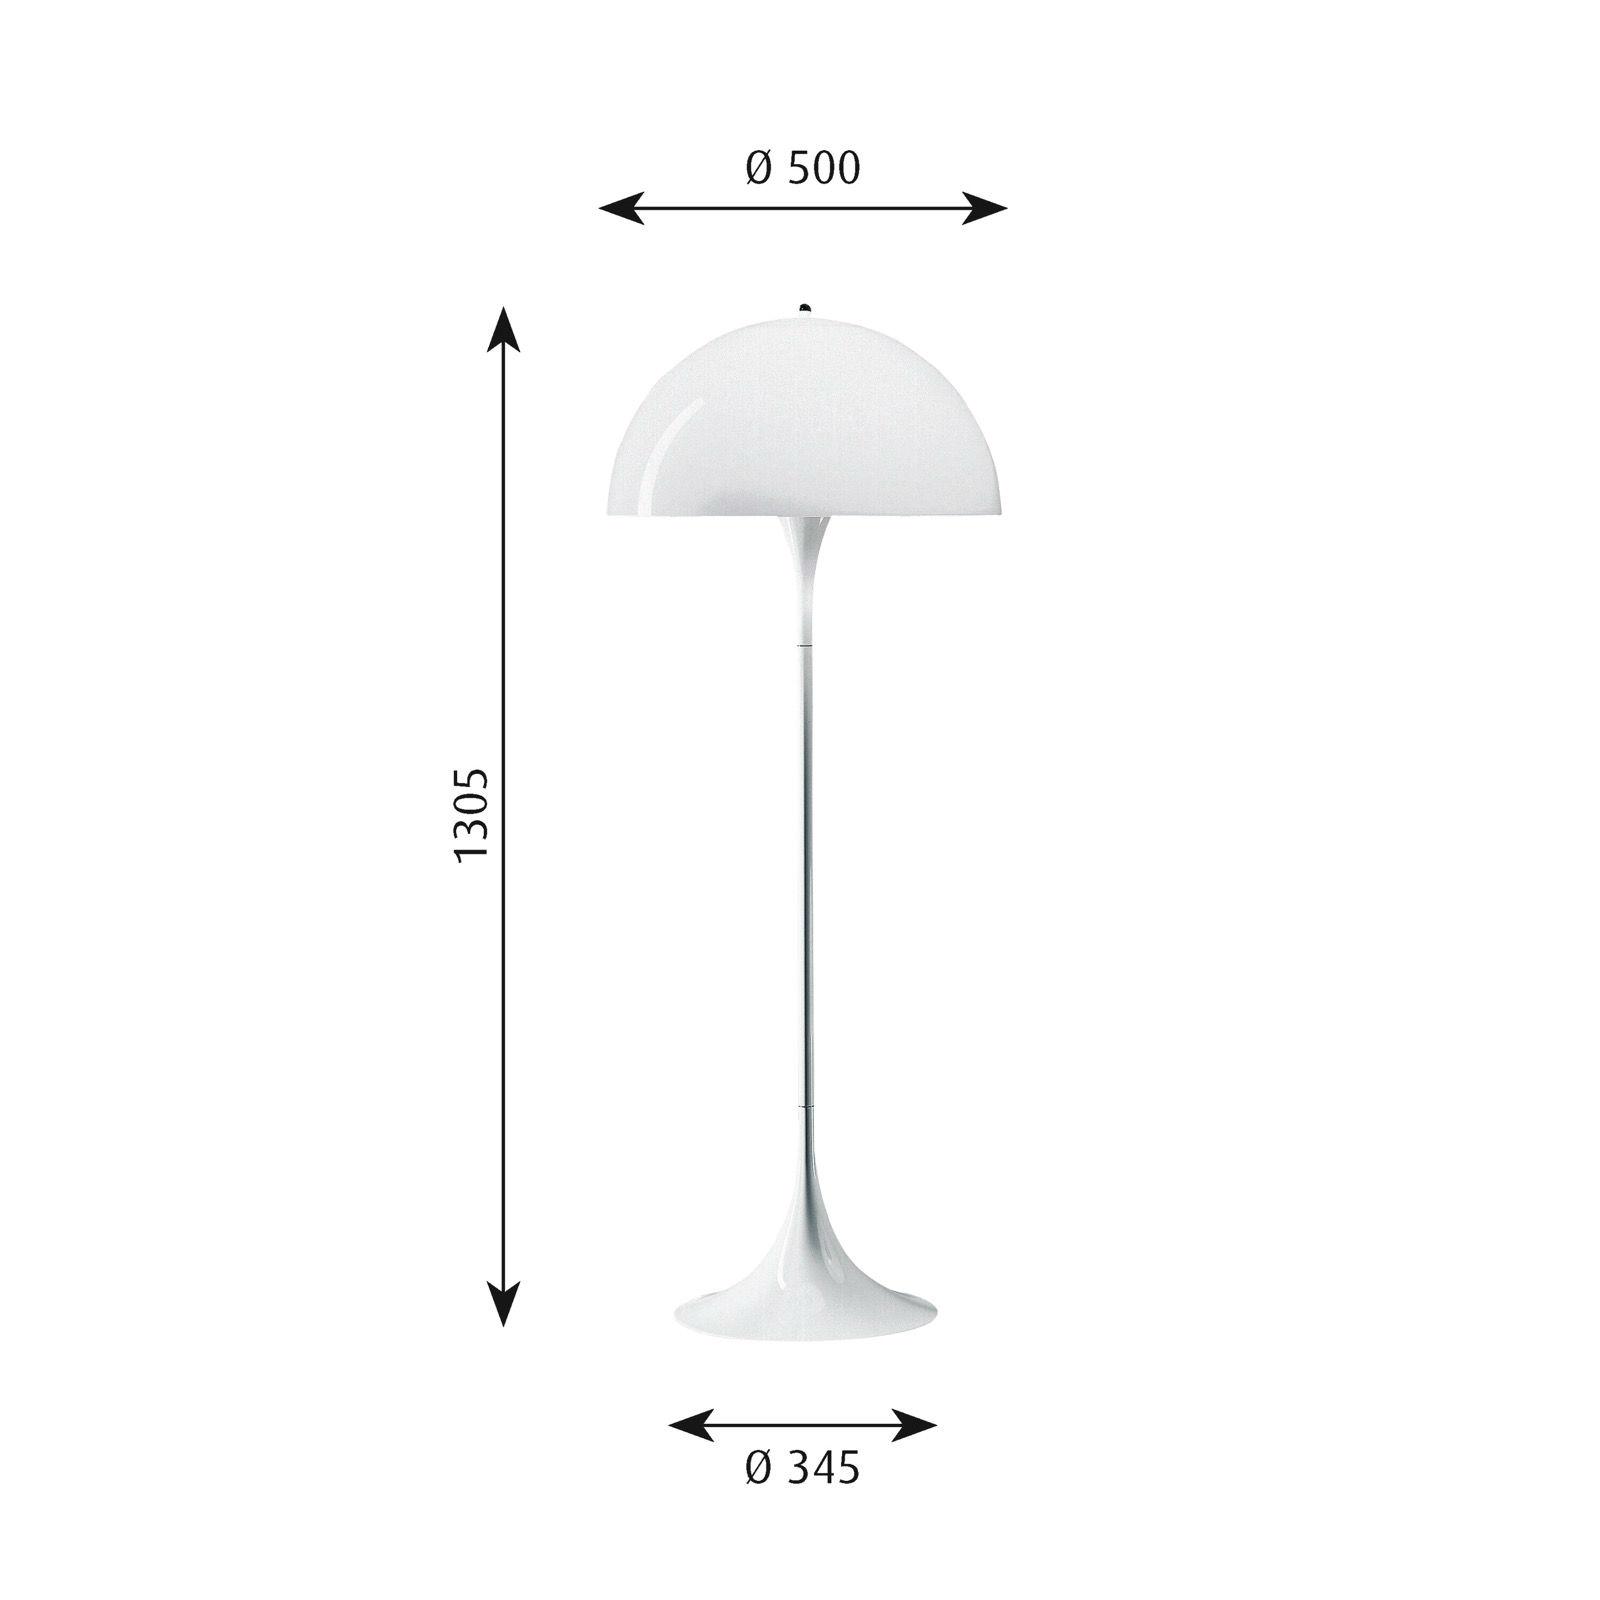 louis poulsen panthella vloerlamp matser wageningen. Black Bedroom Furniture Sets. Home Design Ideas